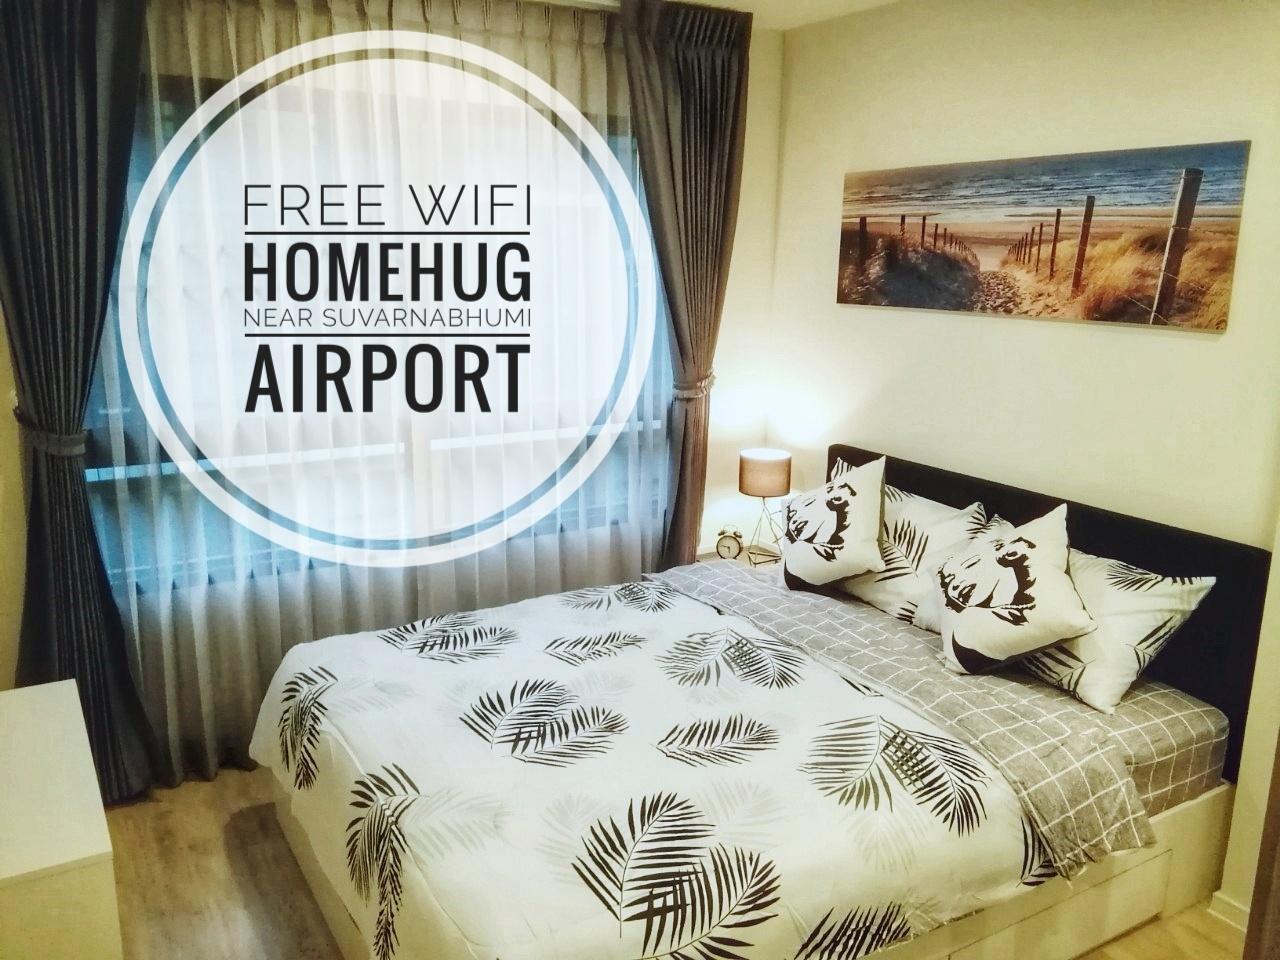 Homehug near Suvarnabhumi Airport 10 mins by Shine อพาร์ตเมนต์ 1 ห้องนอน 1 ห้องน้ำส่วนตัว ขนาด 28 ตร.ม. – สนามบินสุวรรณภูมิ